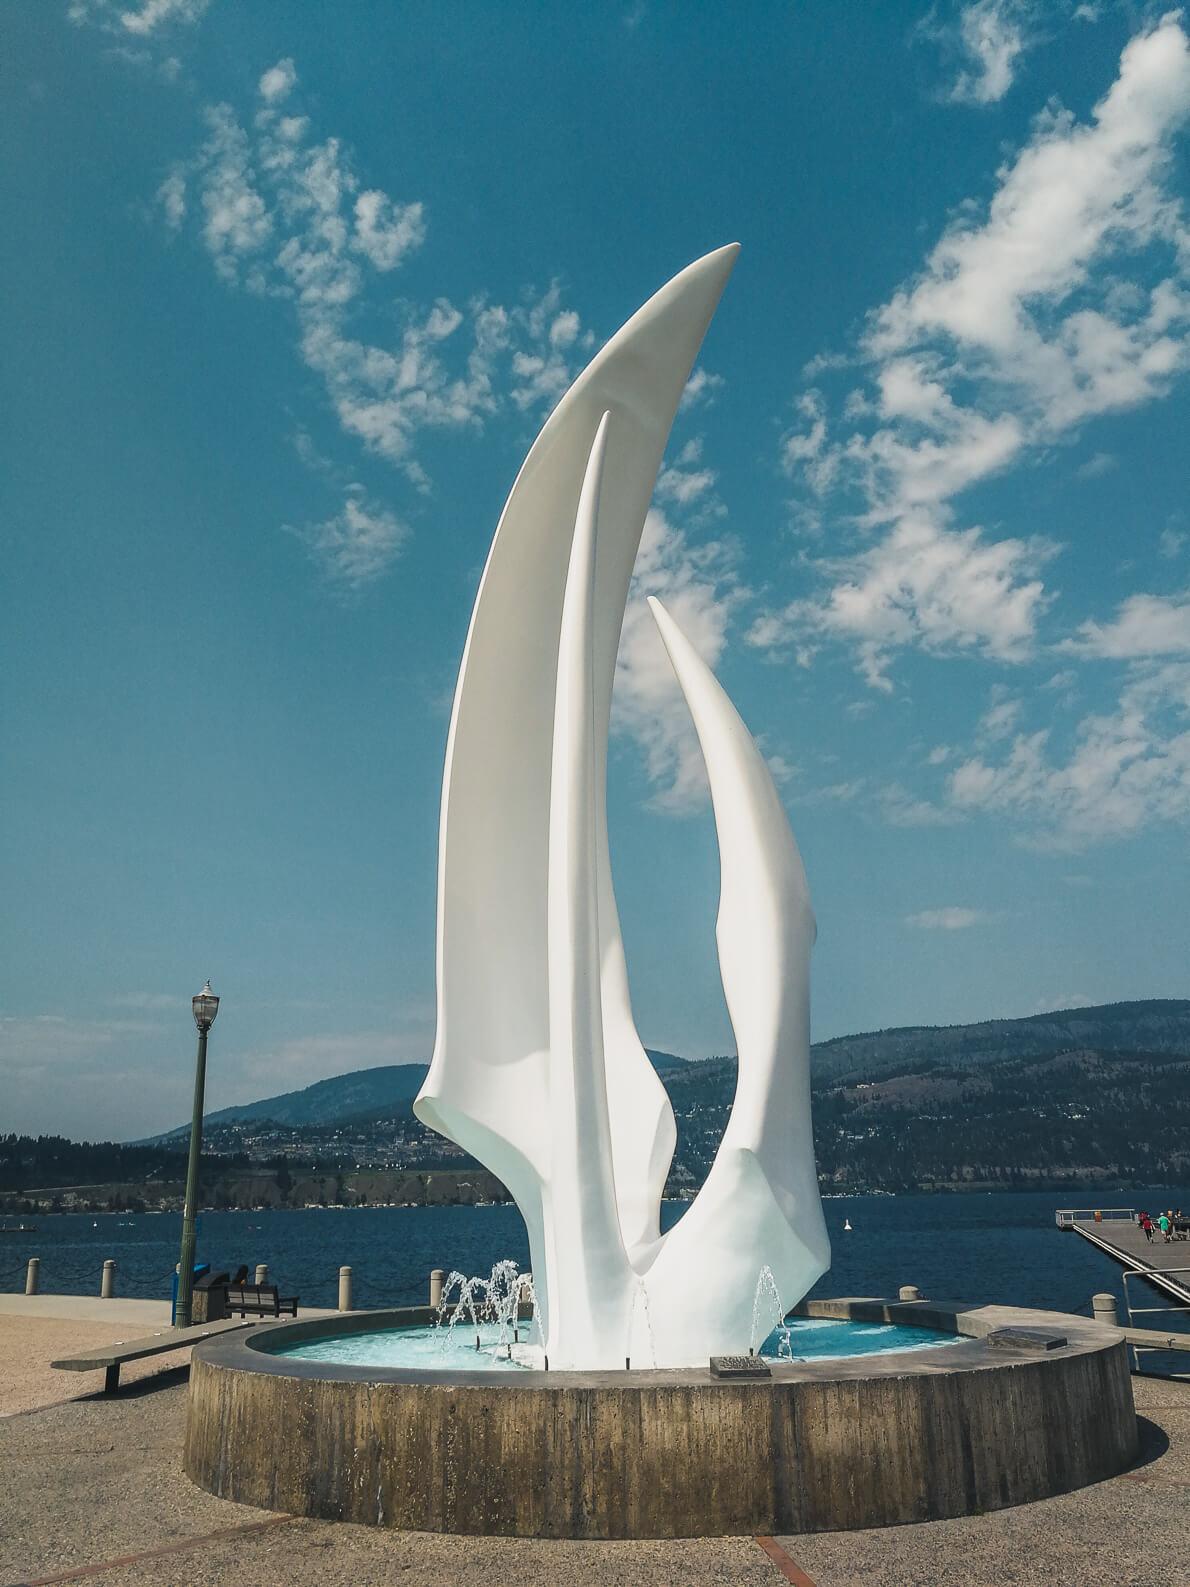 Spirit of Sail Skulptur an der Ufepromenade in Kelowna